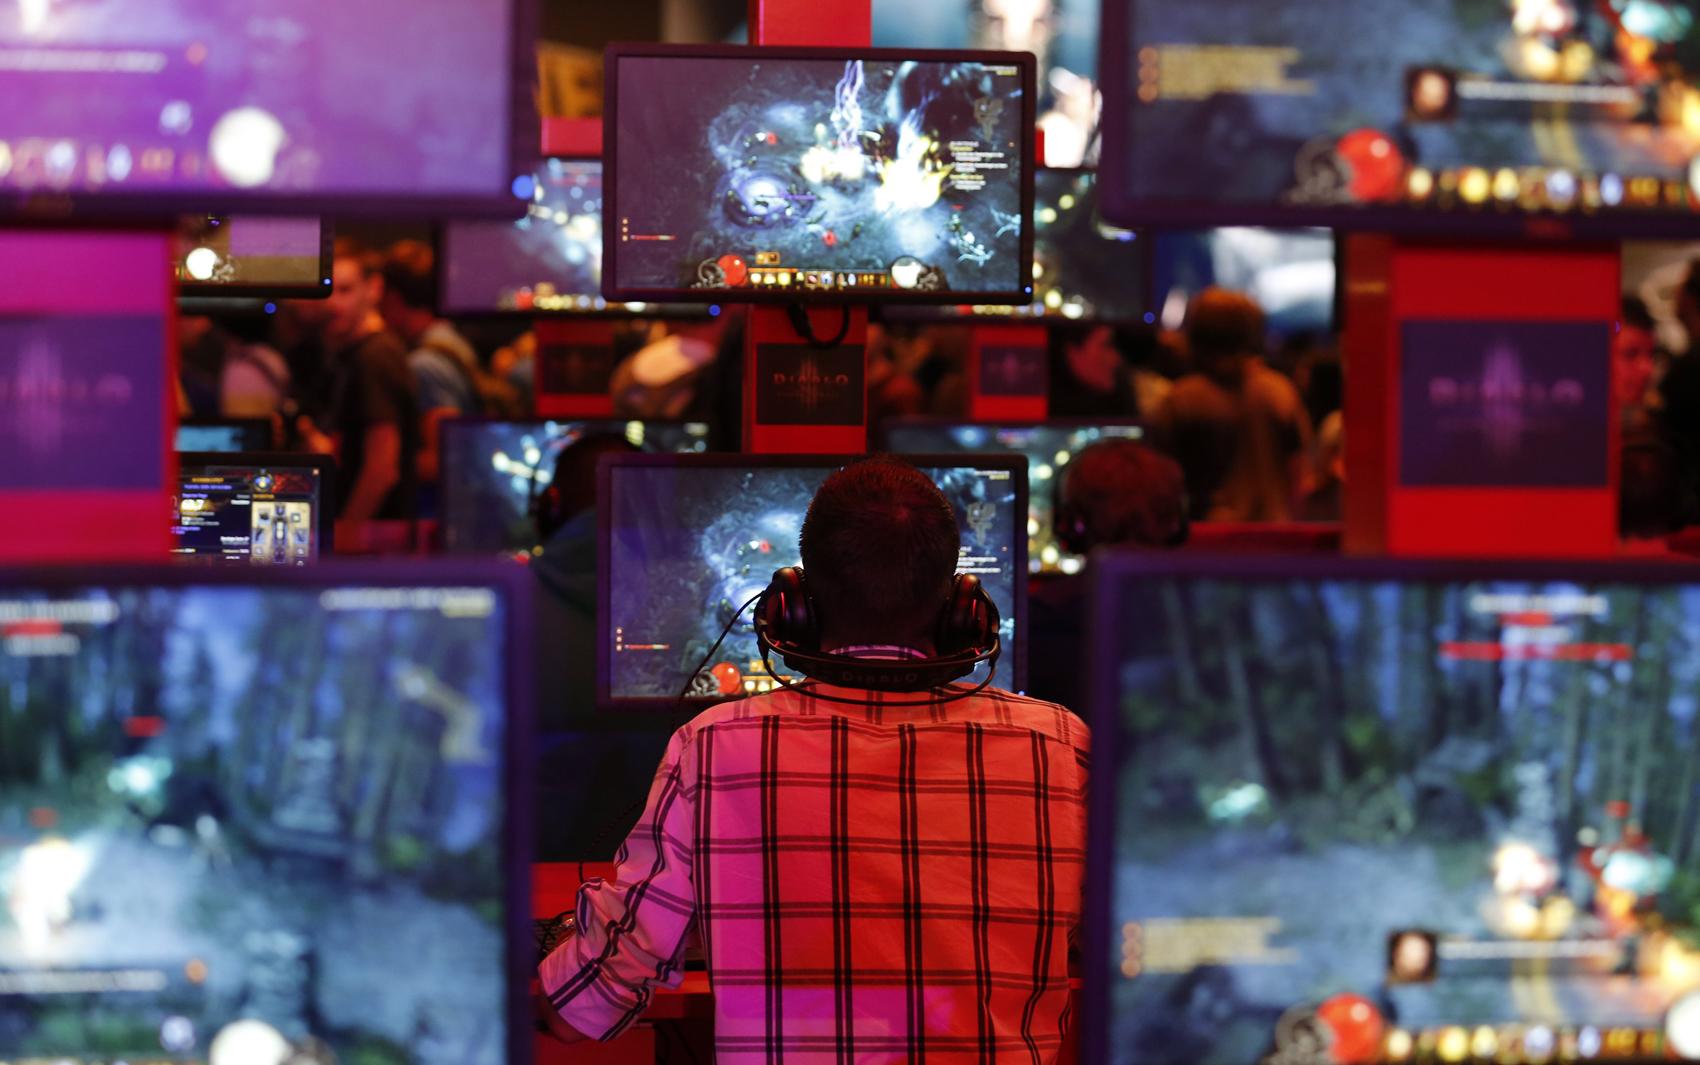 Visitante joga 'Diablo III' no estande da Blizzard na Gamescom nesta sexta-feira (23)